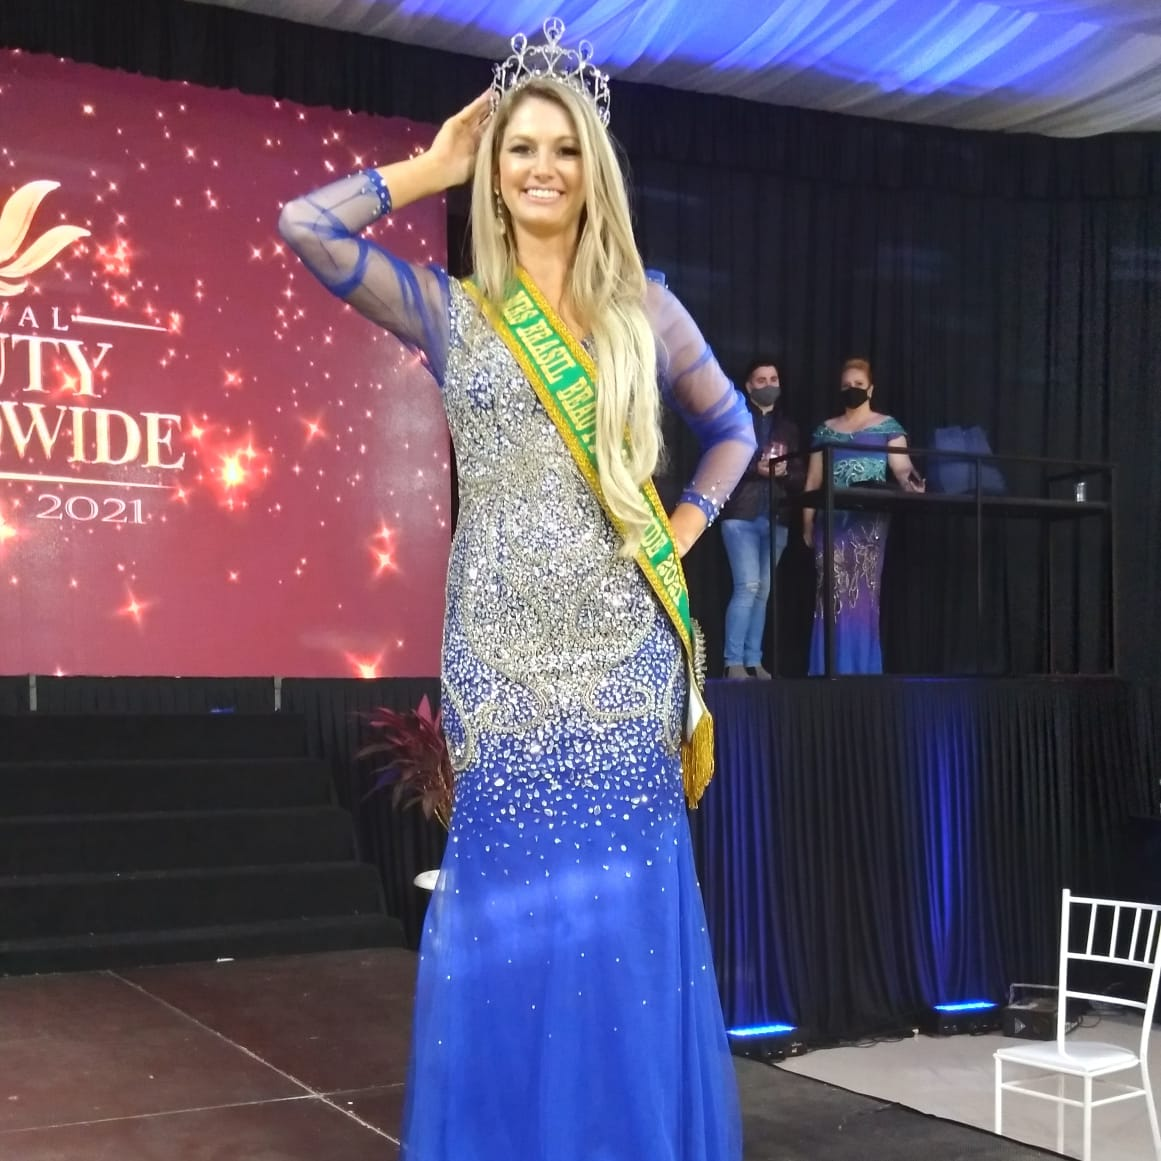 Beauty Worldwide 2021: Luizalvense é a nova Mrs. Miss Brasil